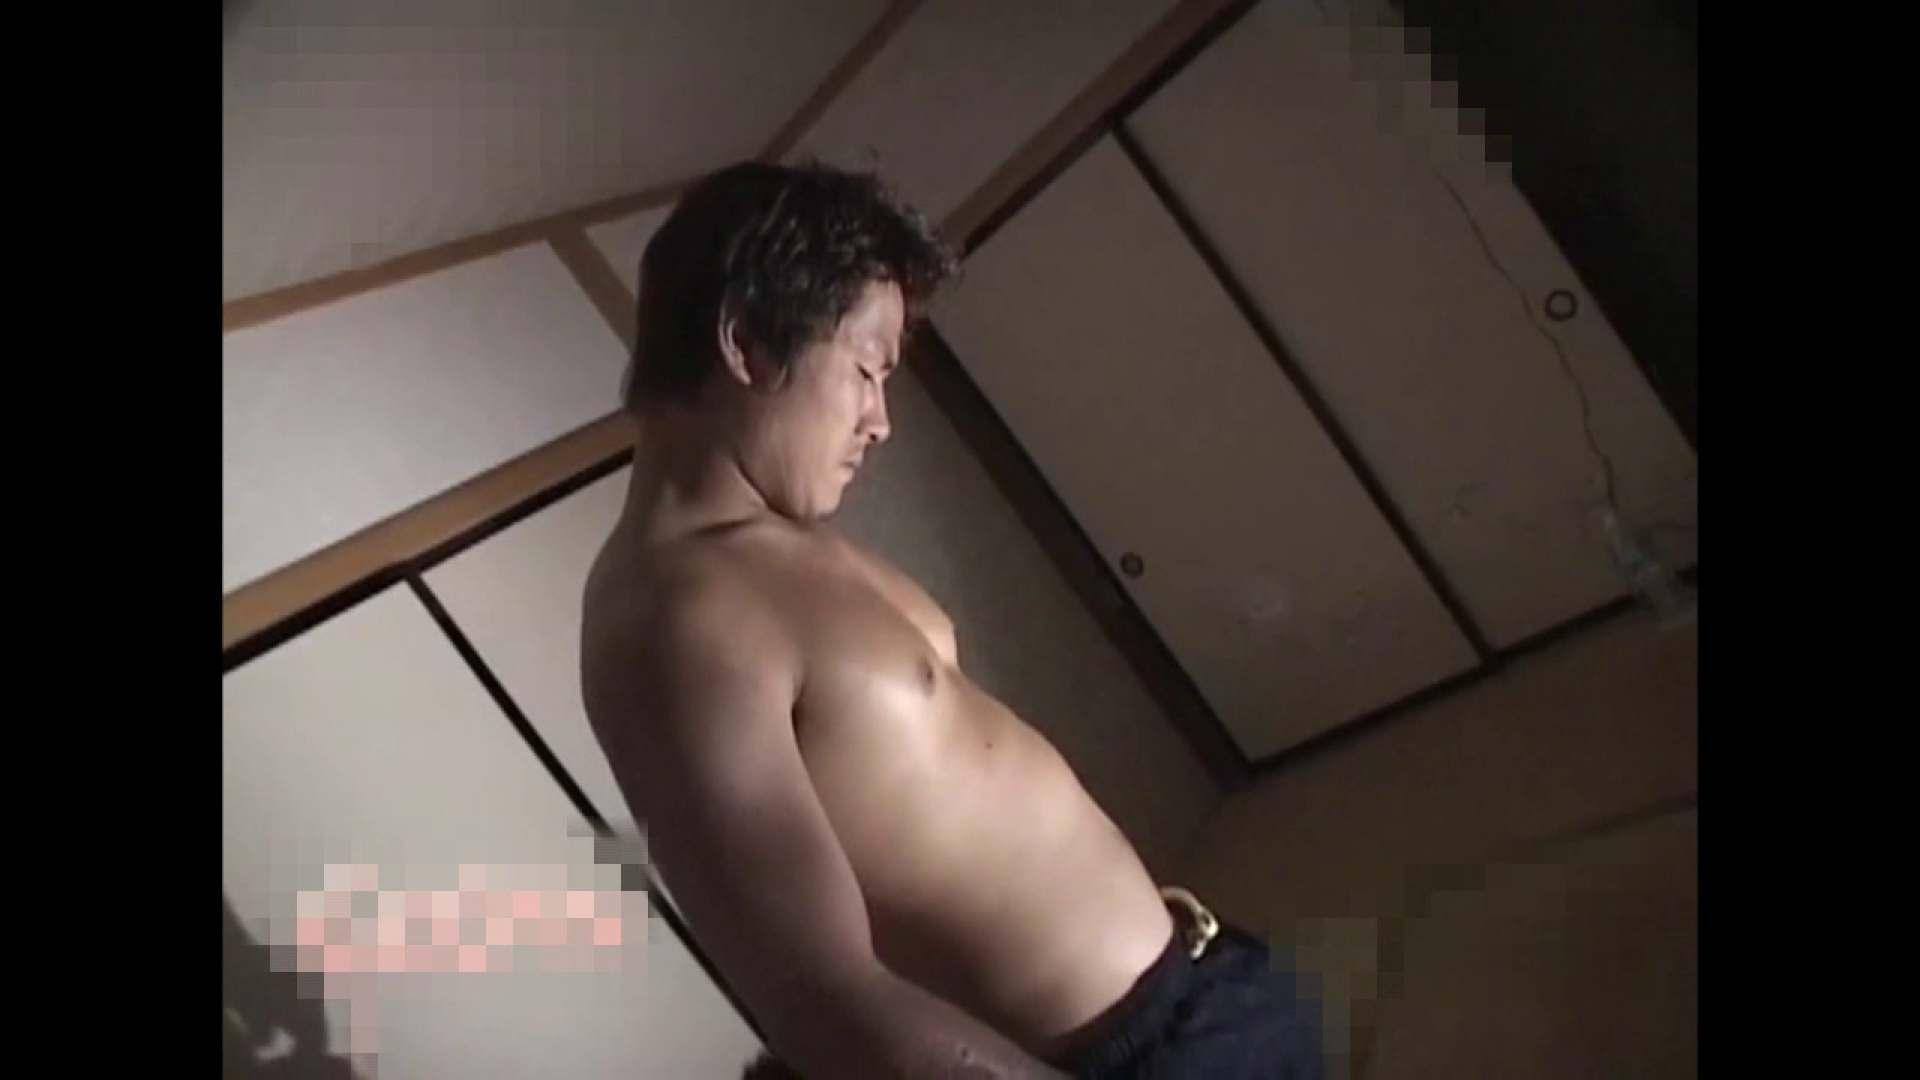 Beautiful muscle モッコリ野郎達!Vol.10 責め ゲイアダルトビデオ画像 39連発 20